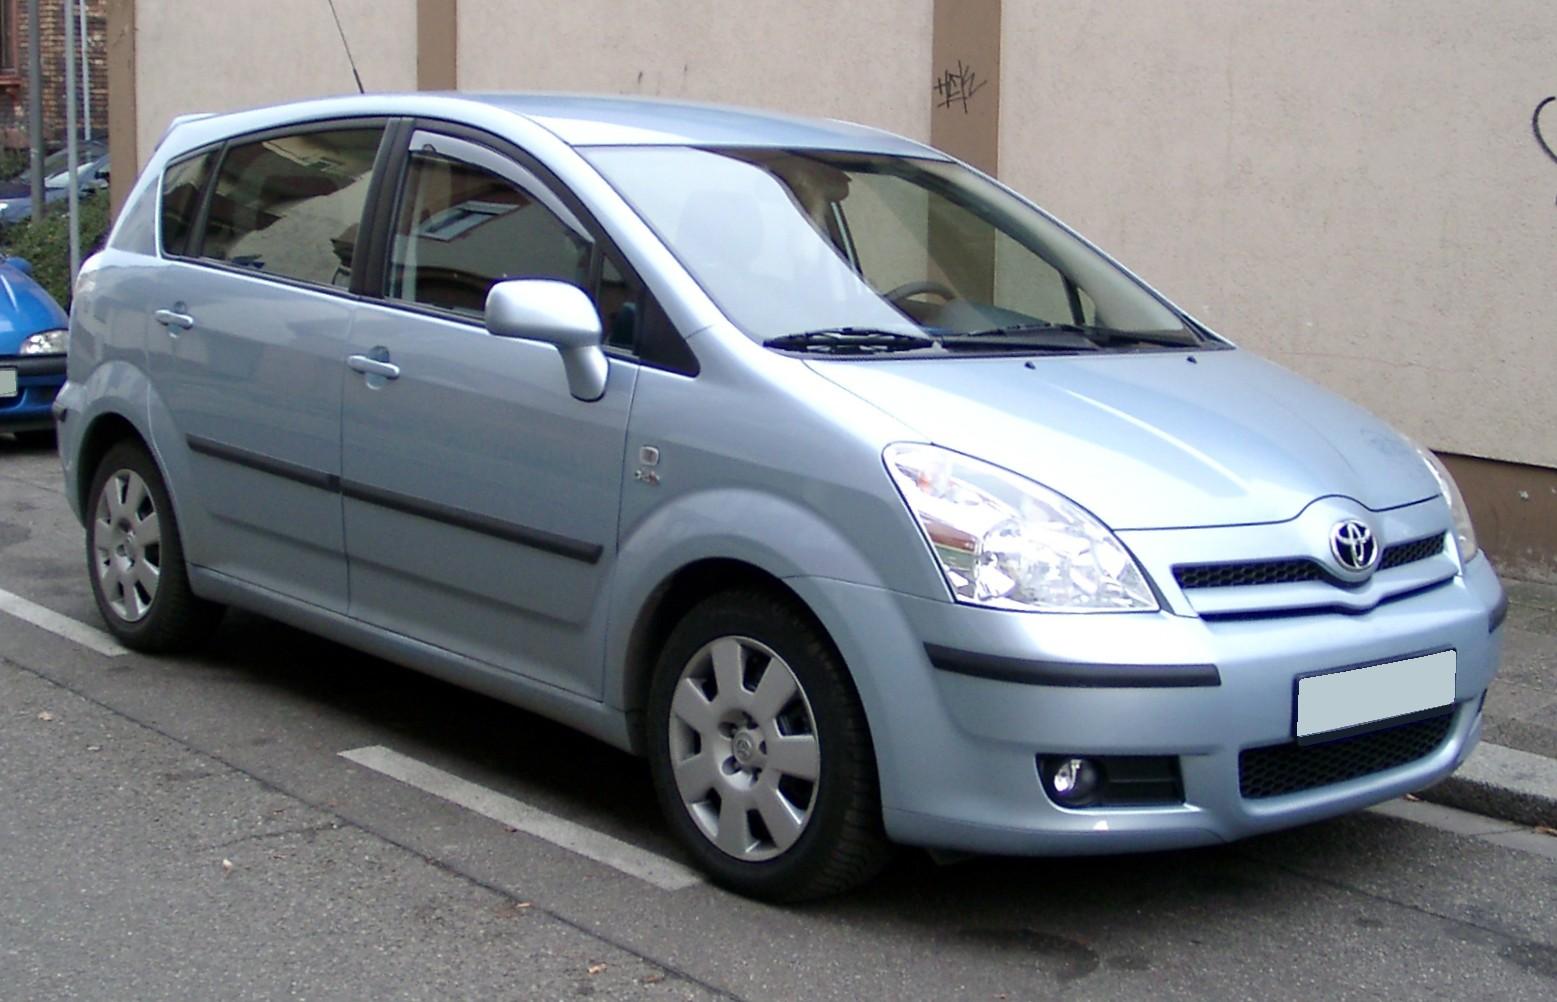 File:Toyota Corolla Verso front 20080115.jpg  Wikimedia Commons